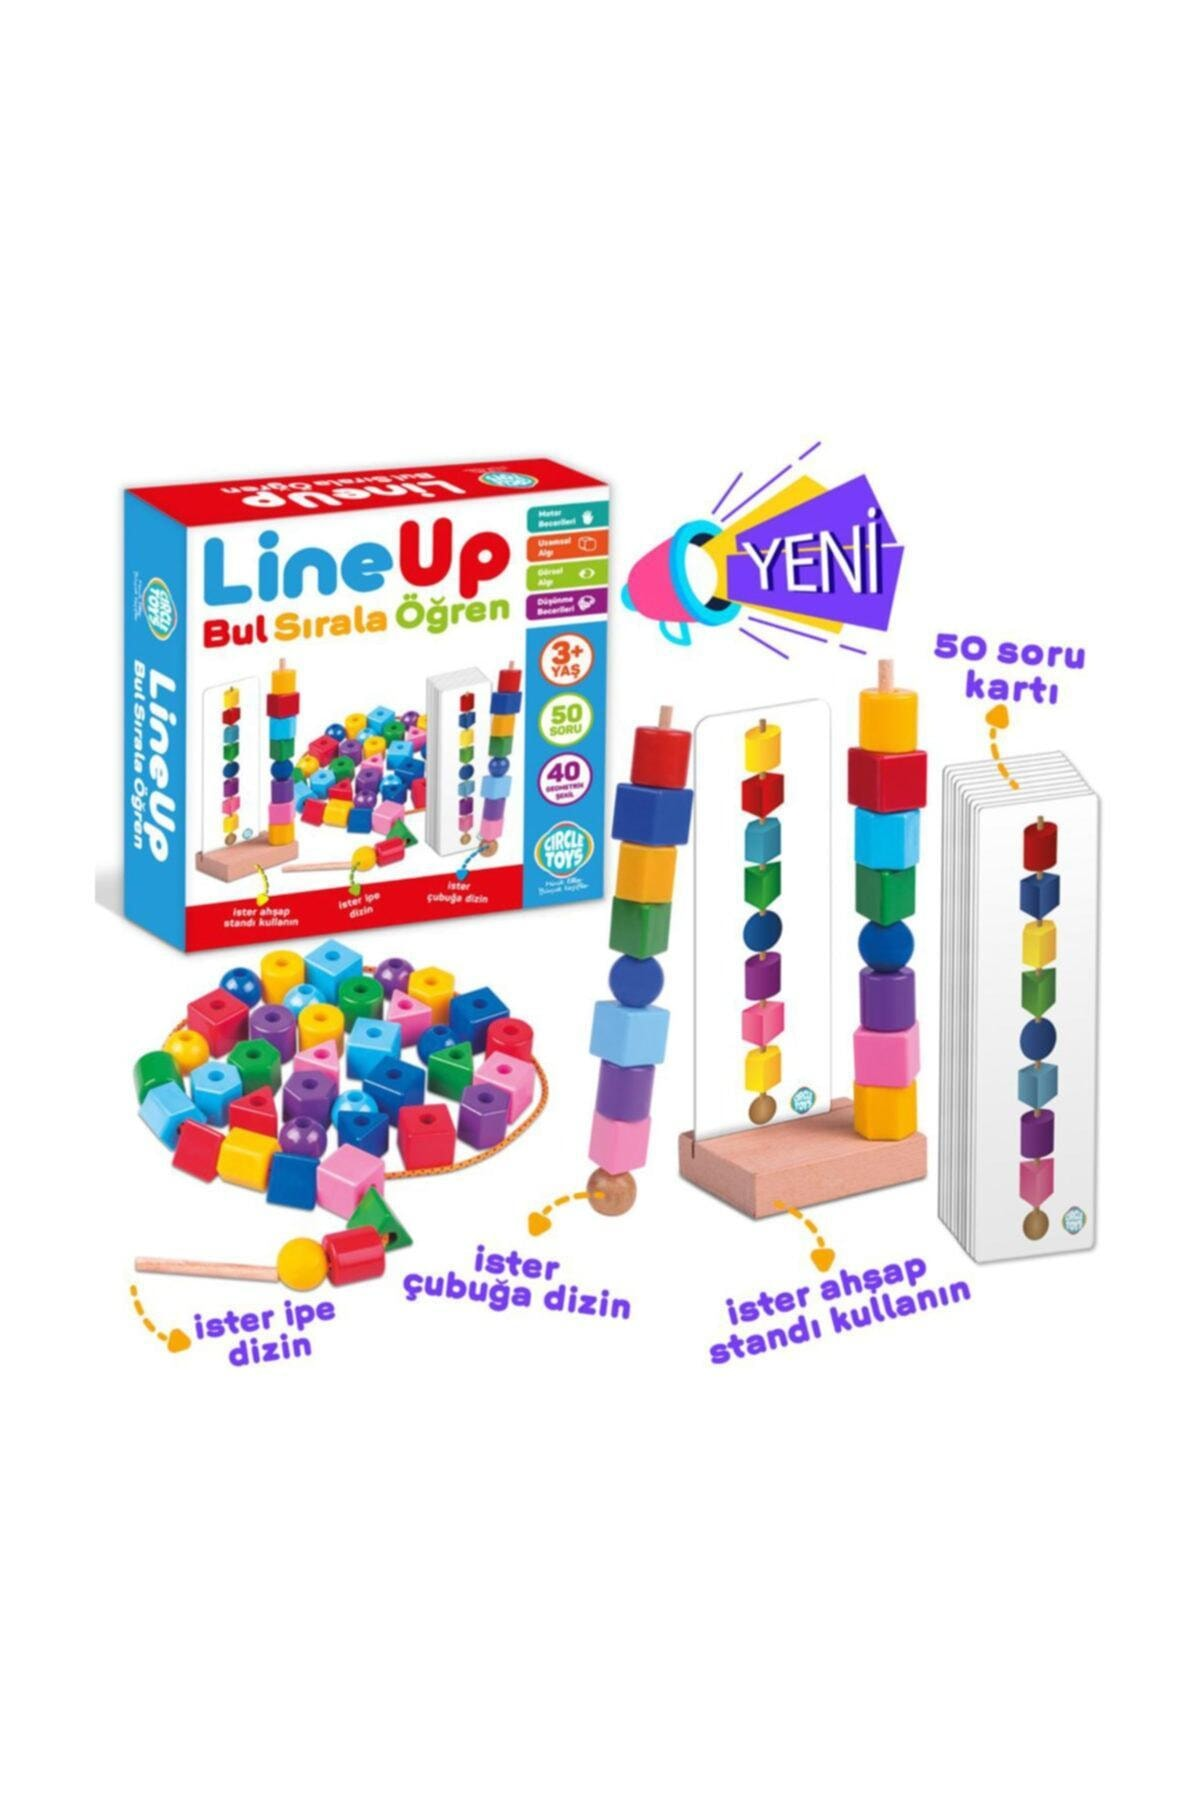 line up Circle Toys Line Up  Bul Sırala Öğren 2